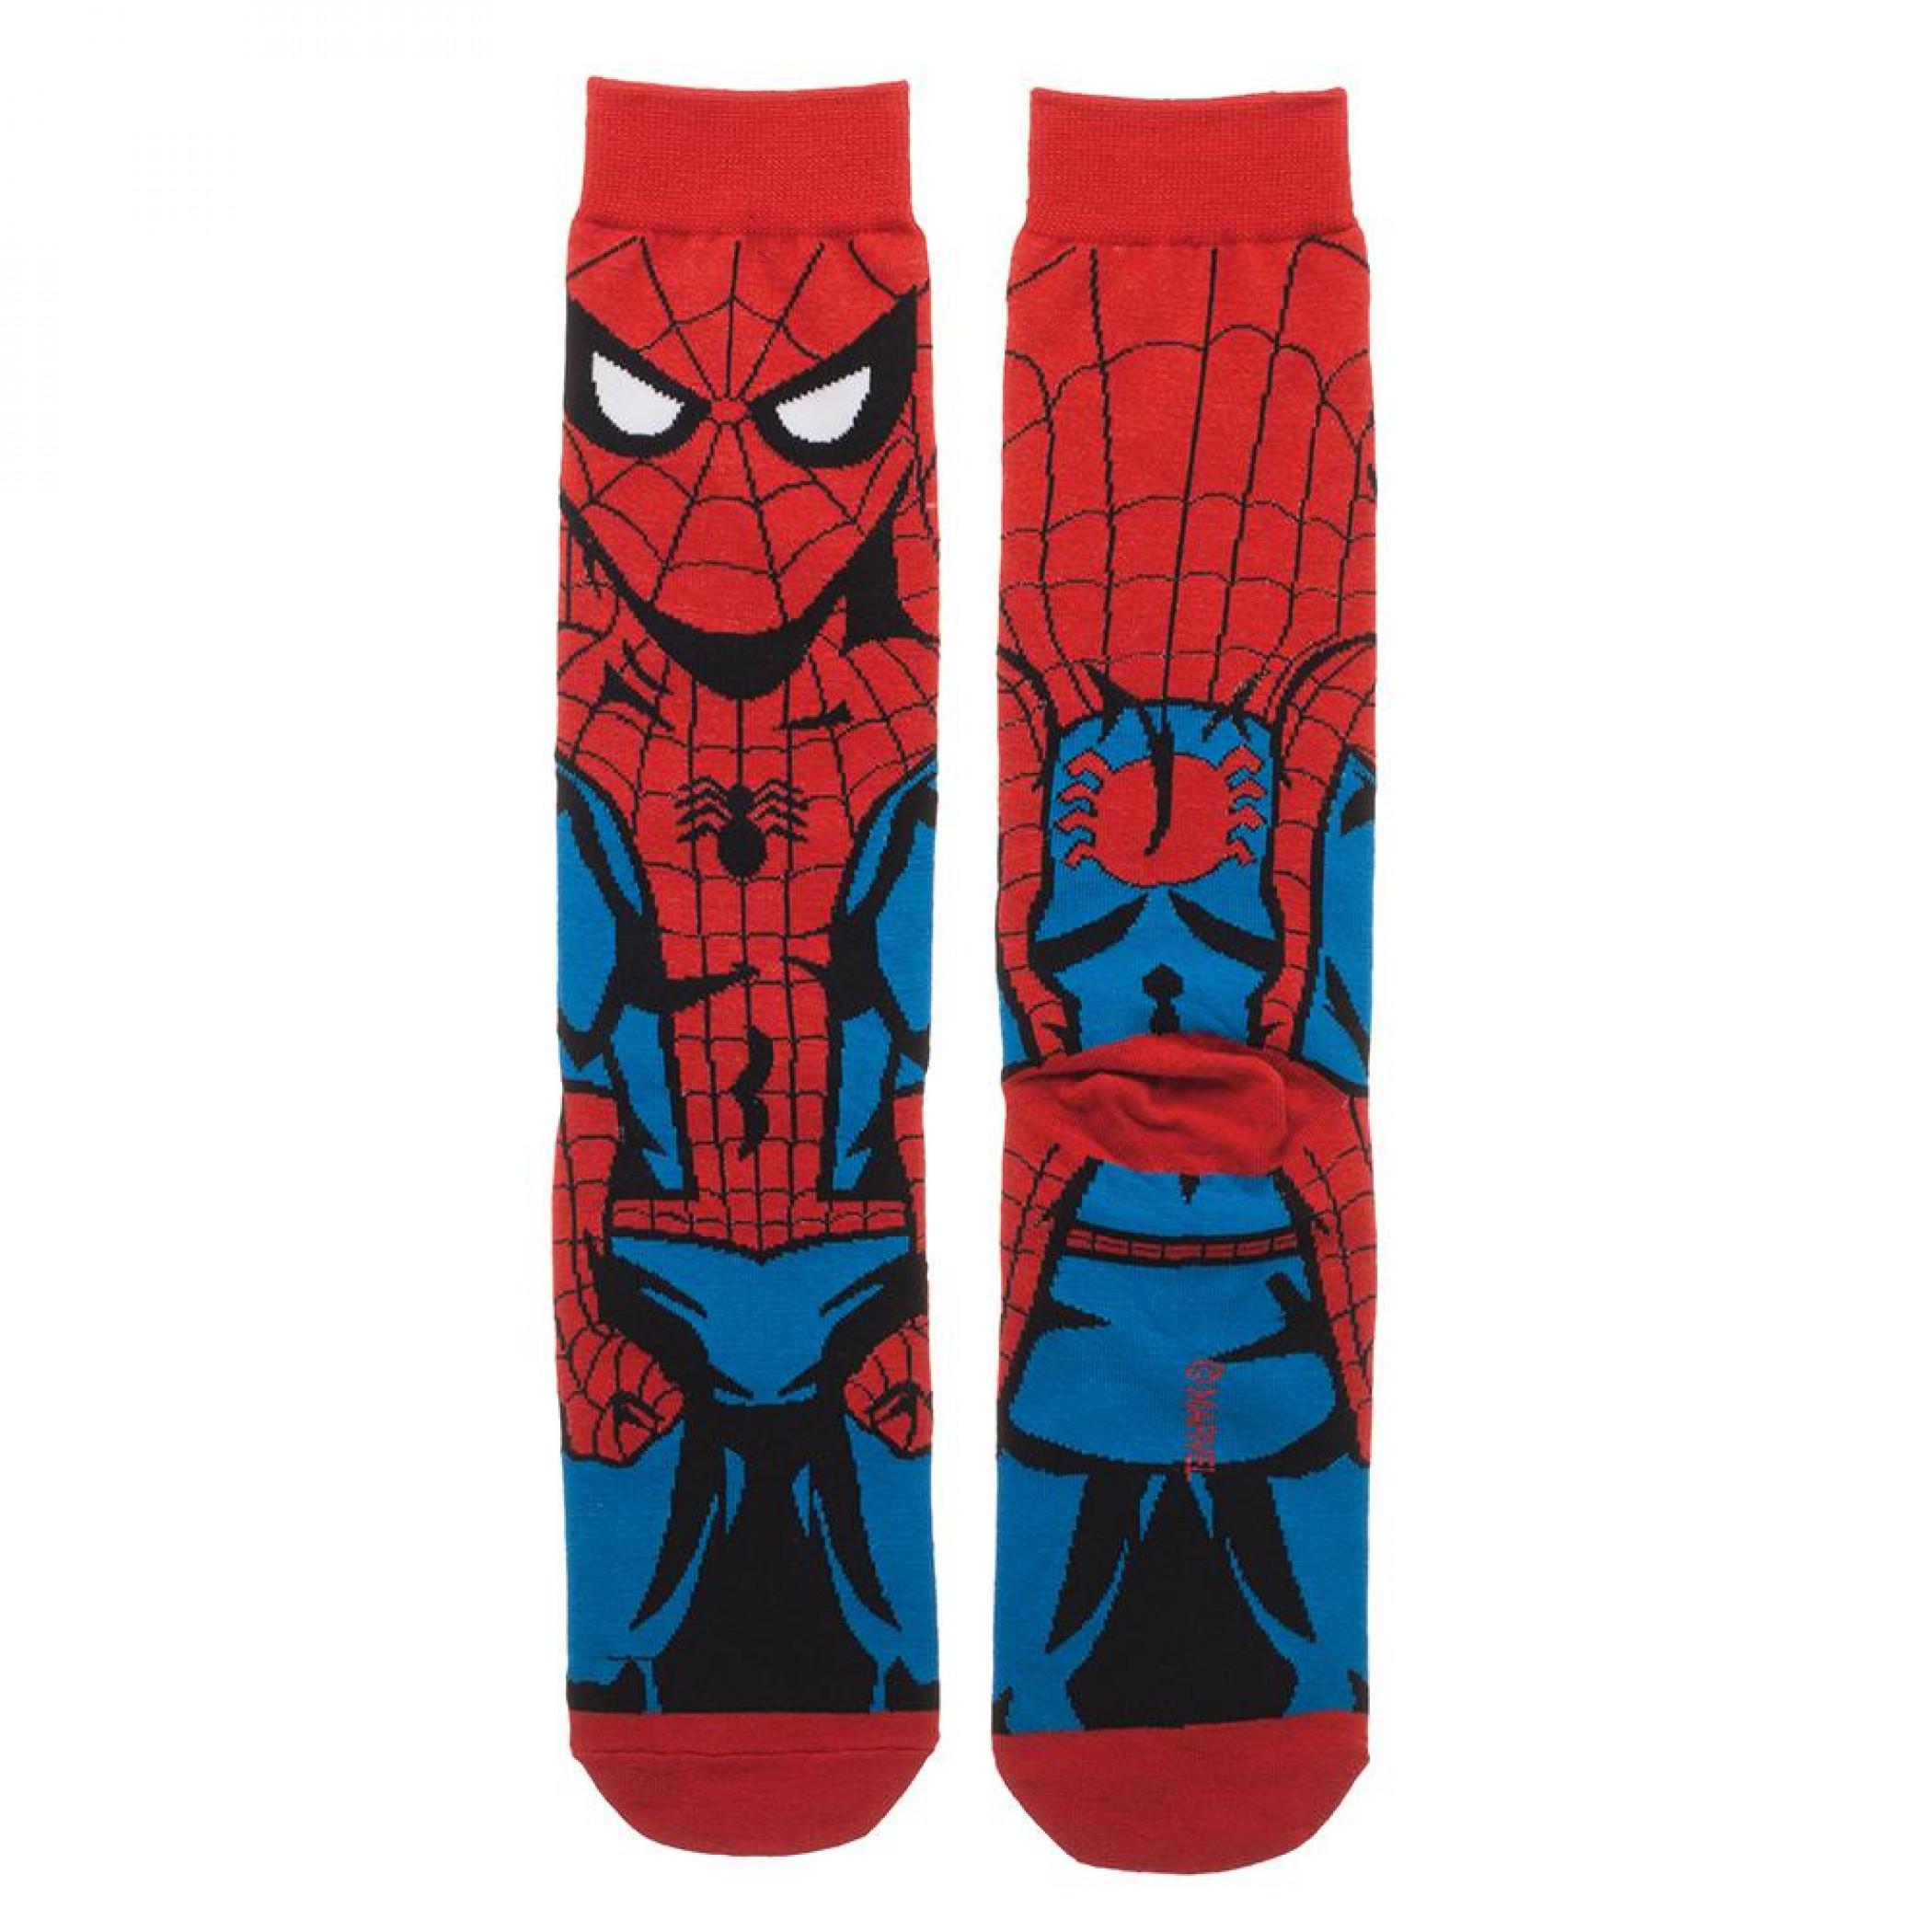 Spider-Man Classic 360 Character Crew Socks